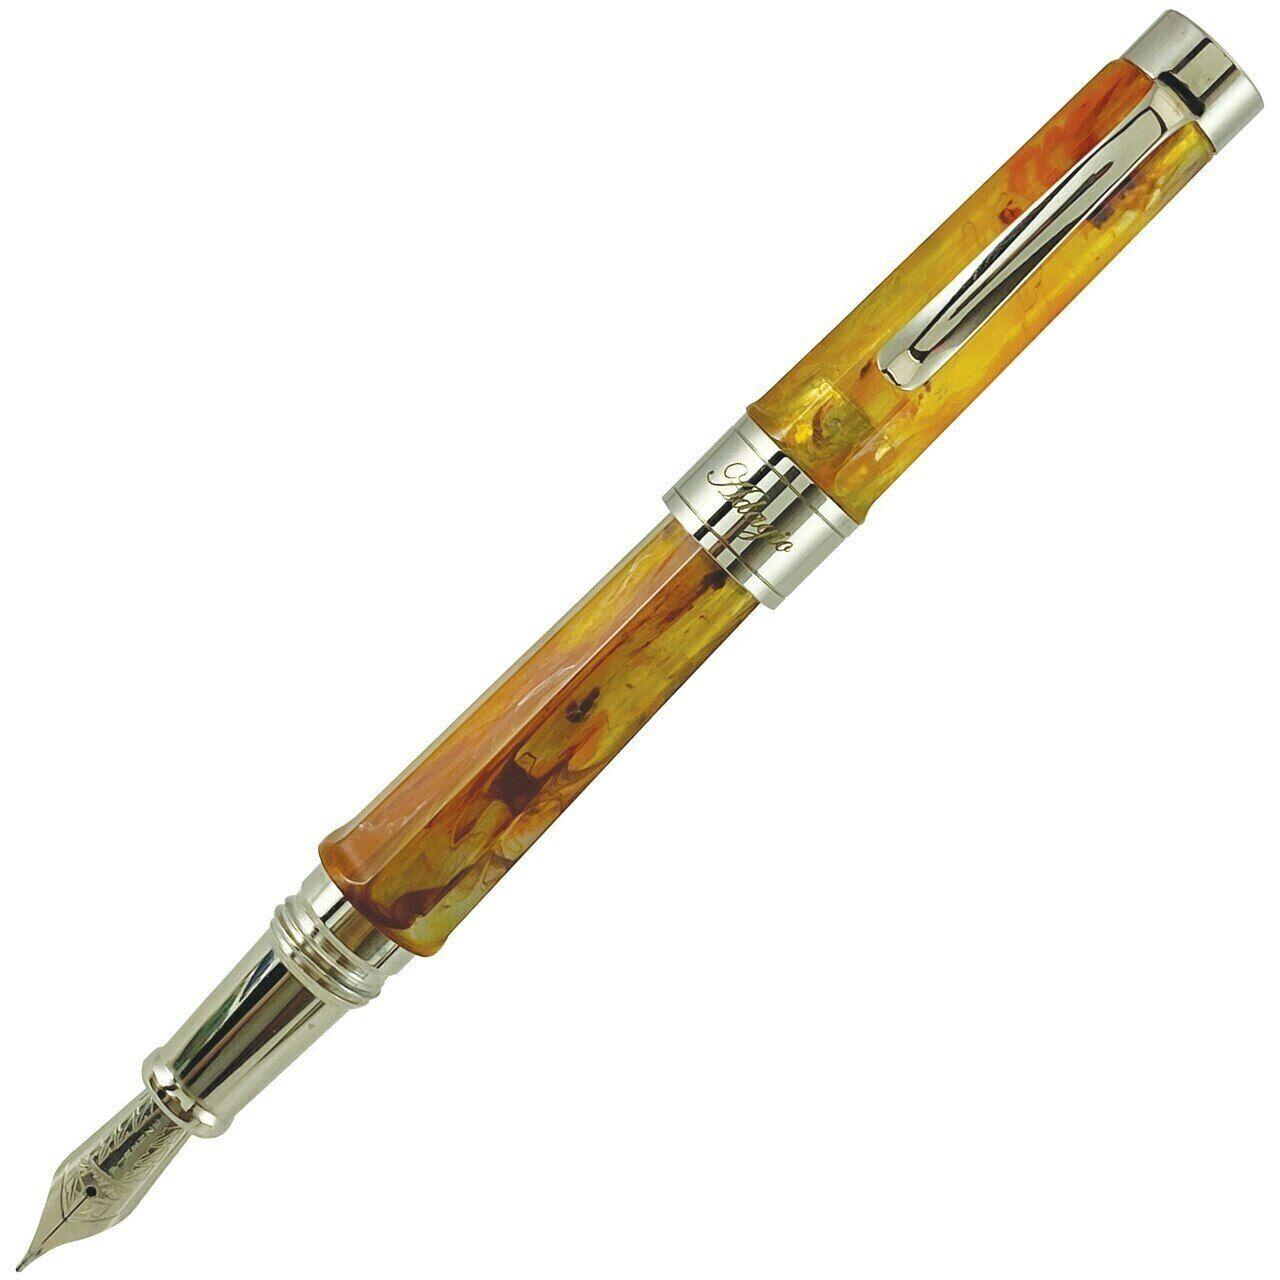 Stipula Adagio Fountain Pen, Amber, Stub Nib, Made In Italy, Brand New In Box Collectibles